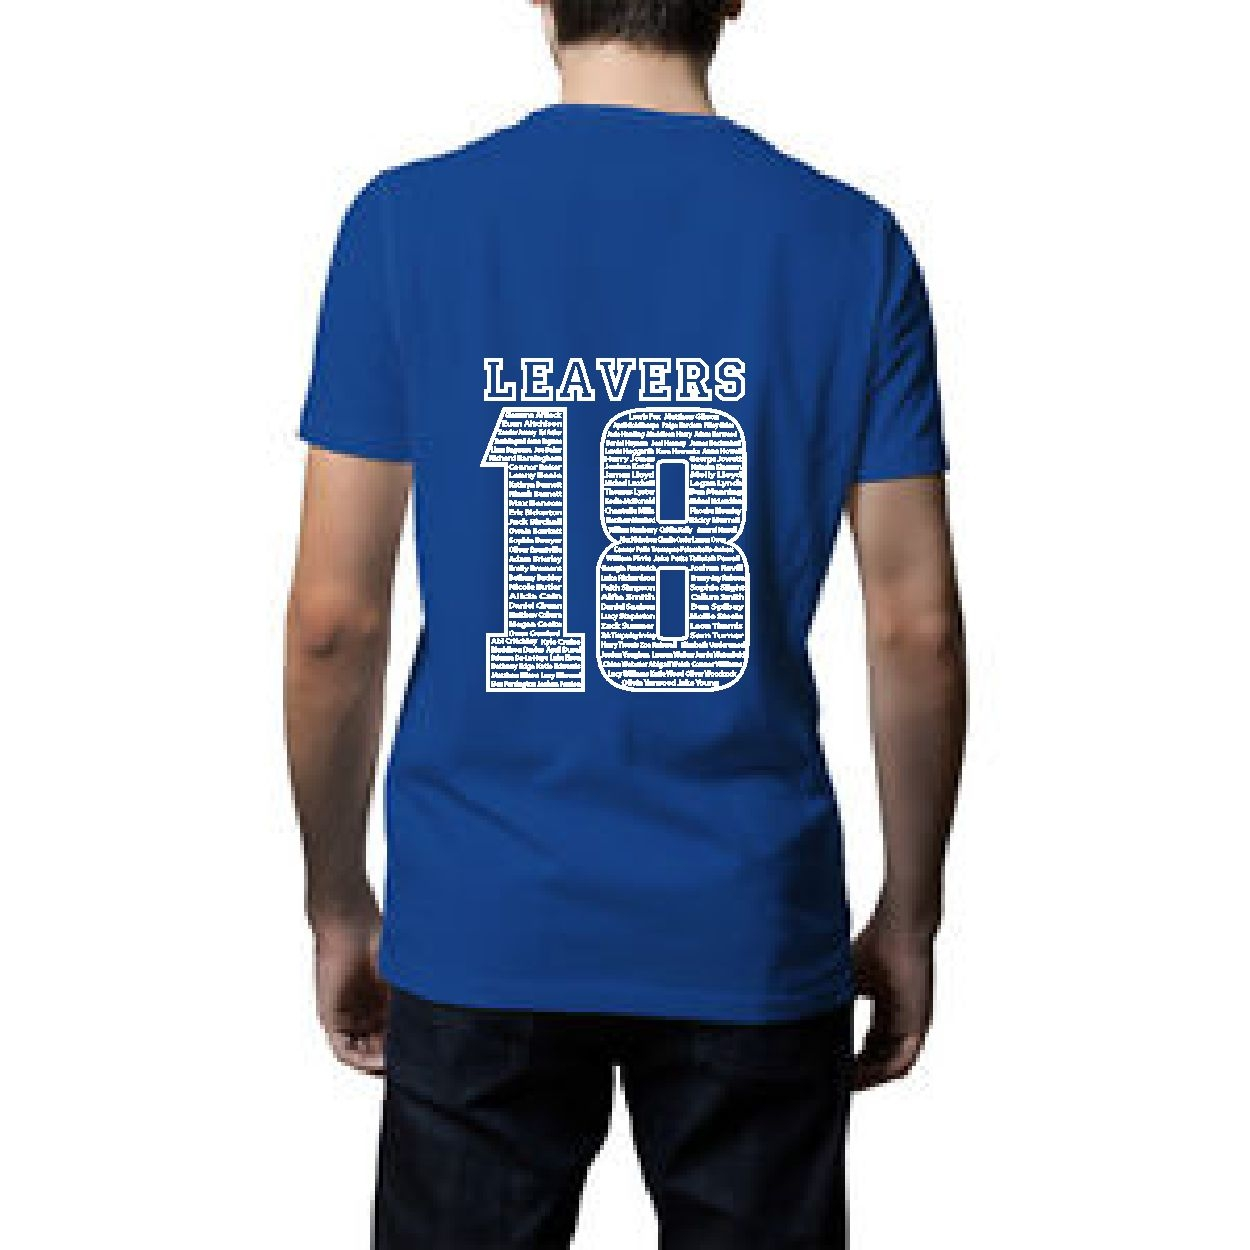 Mablins Leavers T-Shirt 2019-0